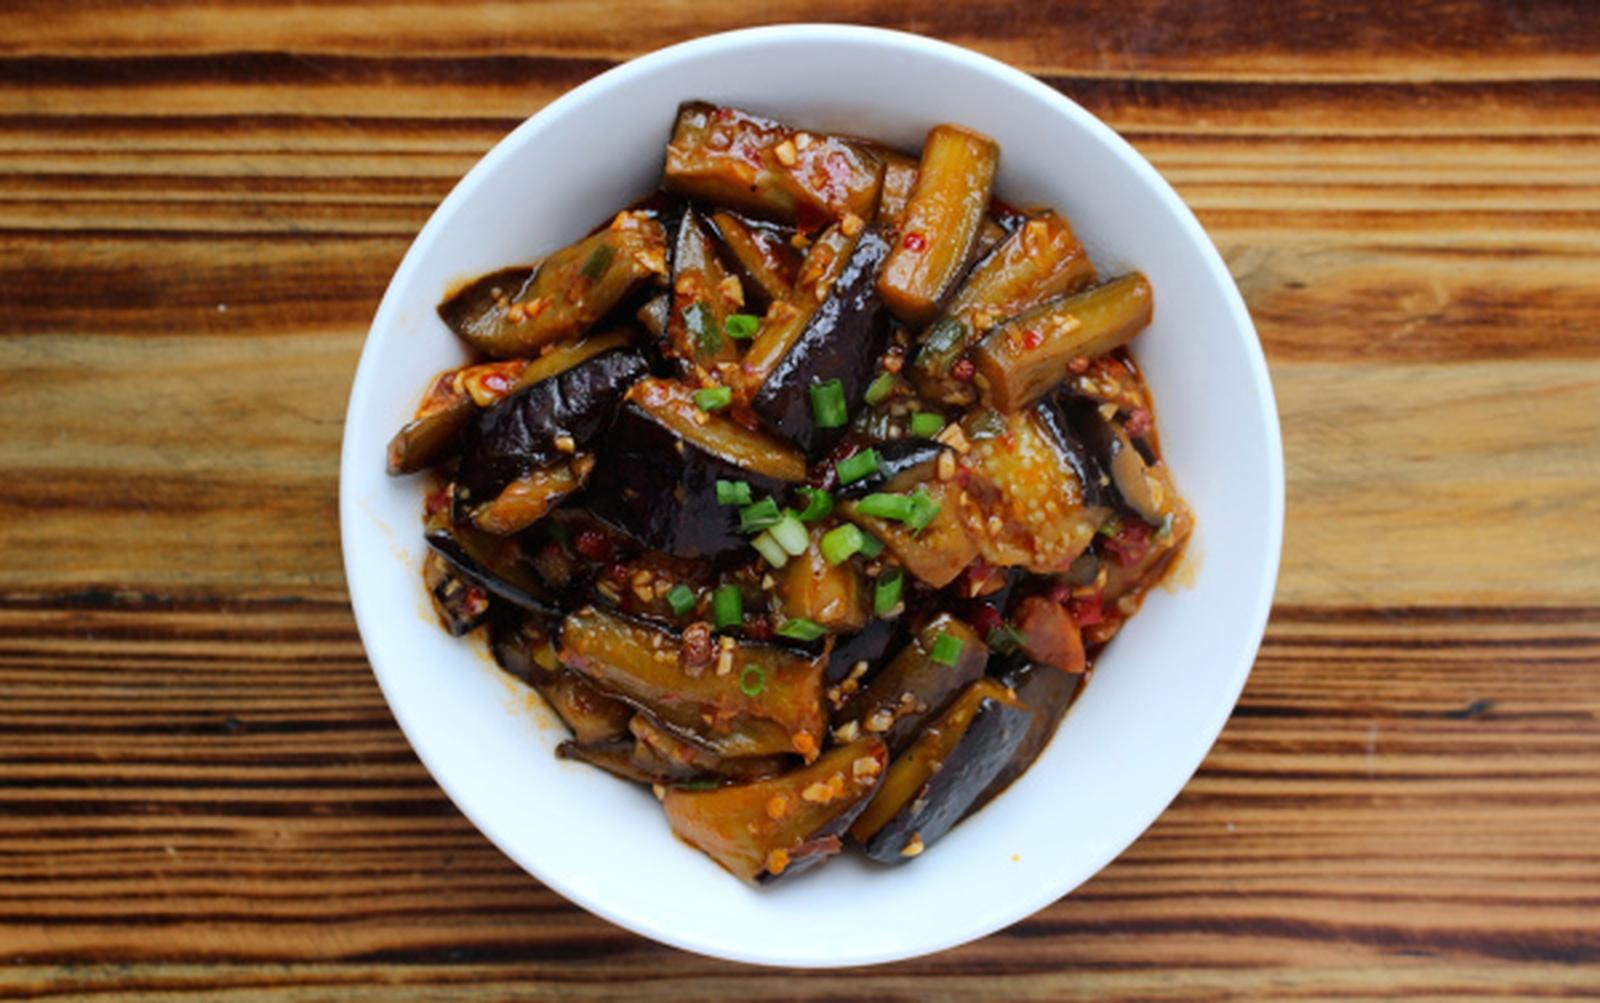 Vegan Fish-Flavored Eggplant [Gluten-Free]